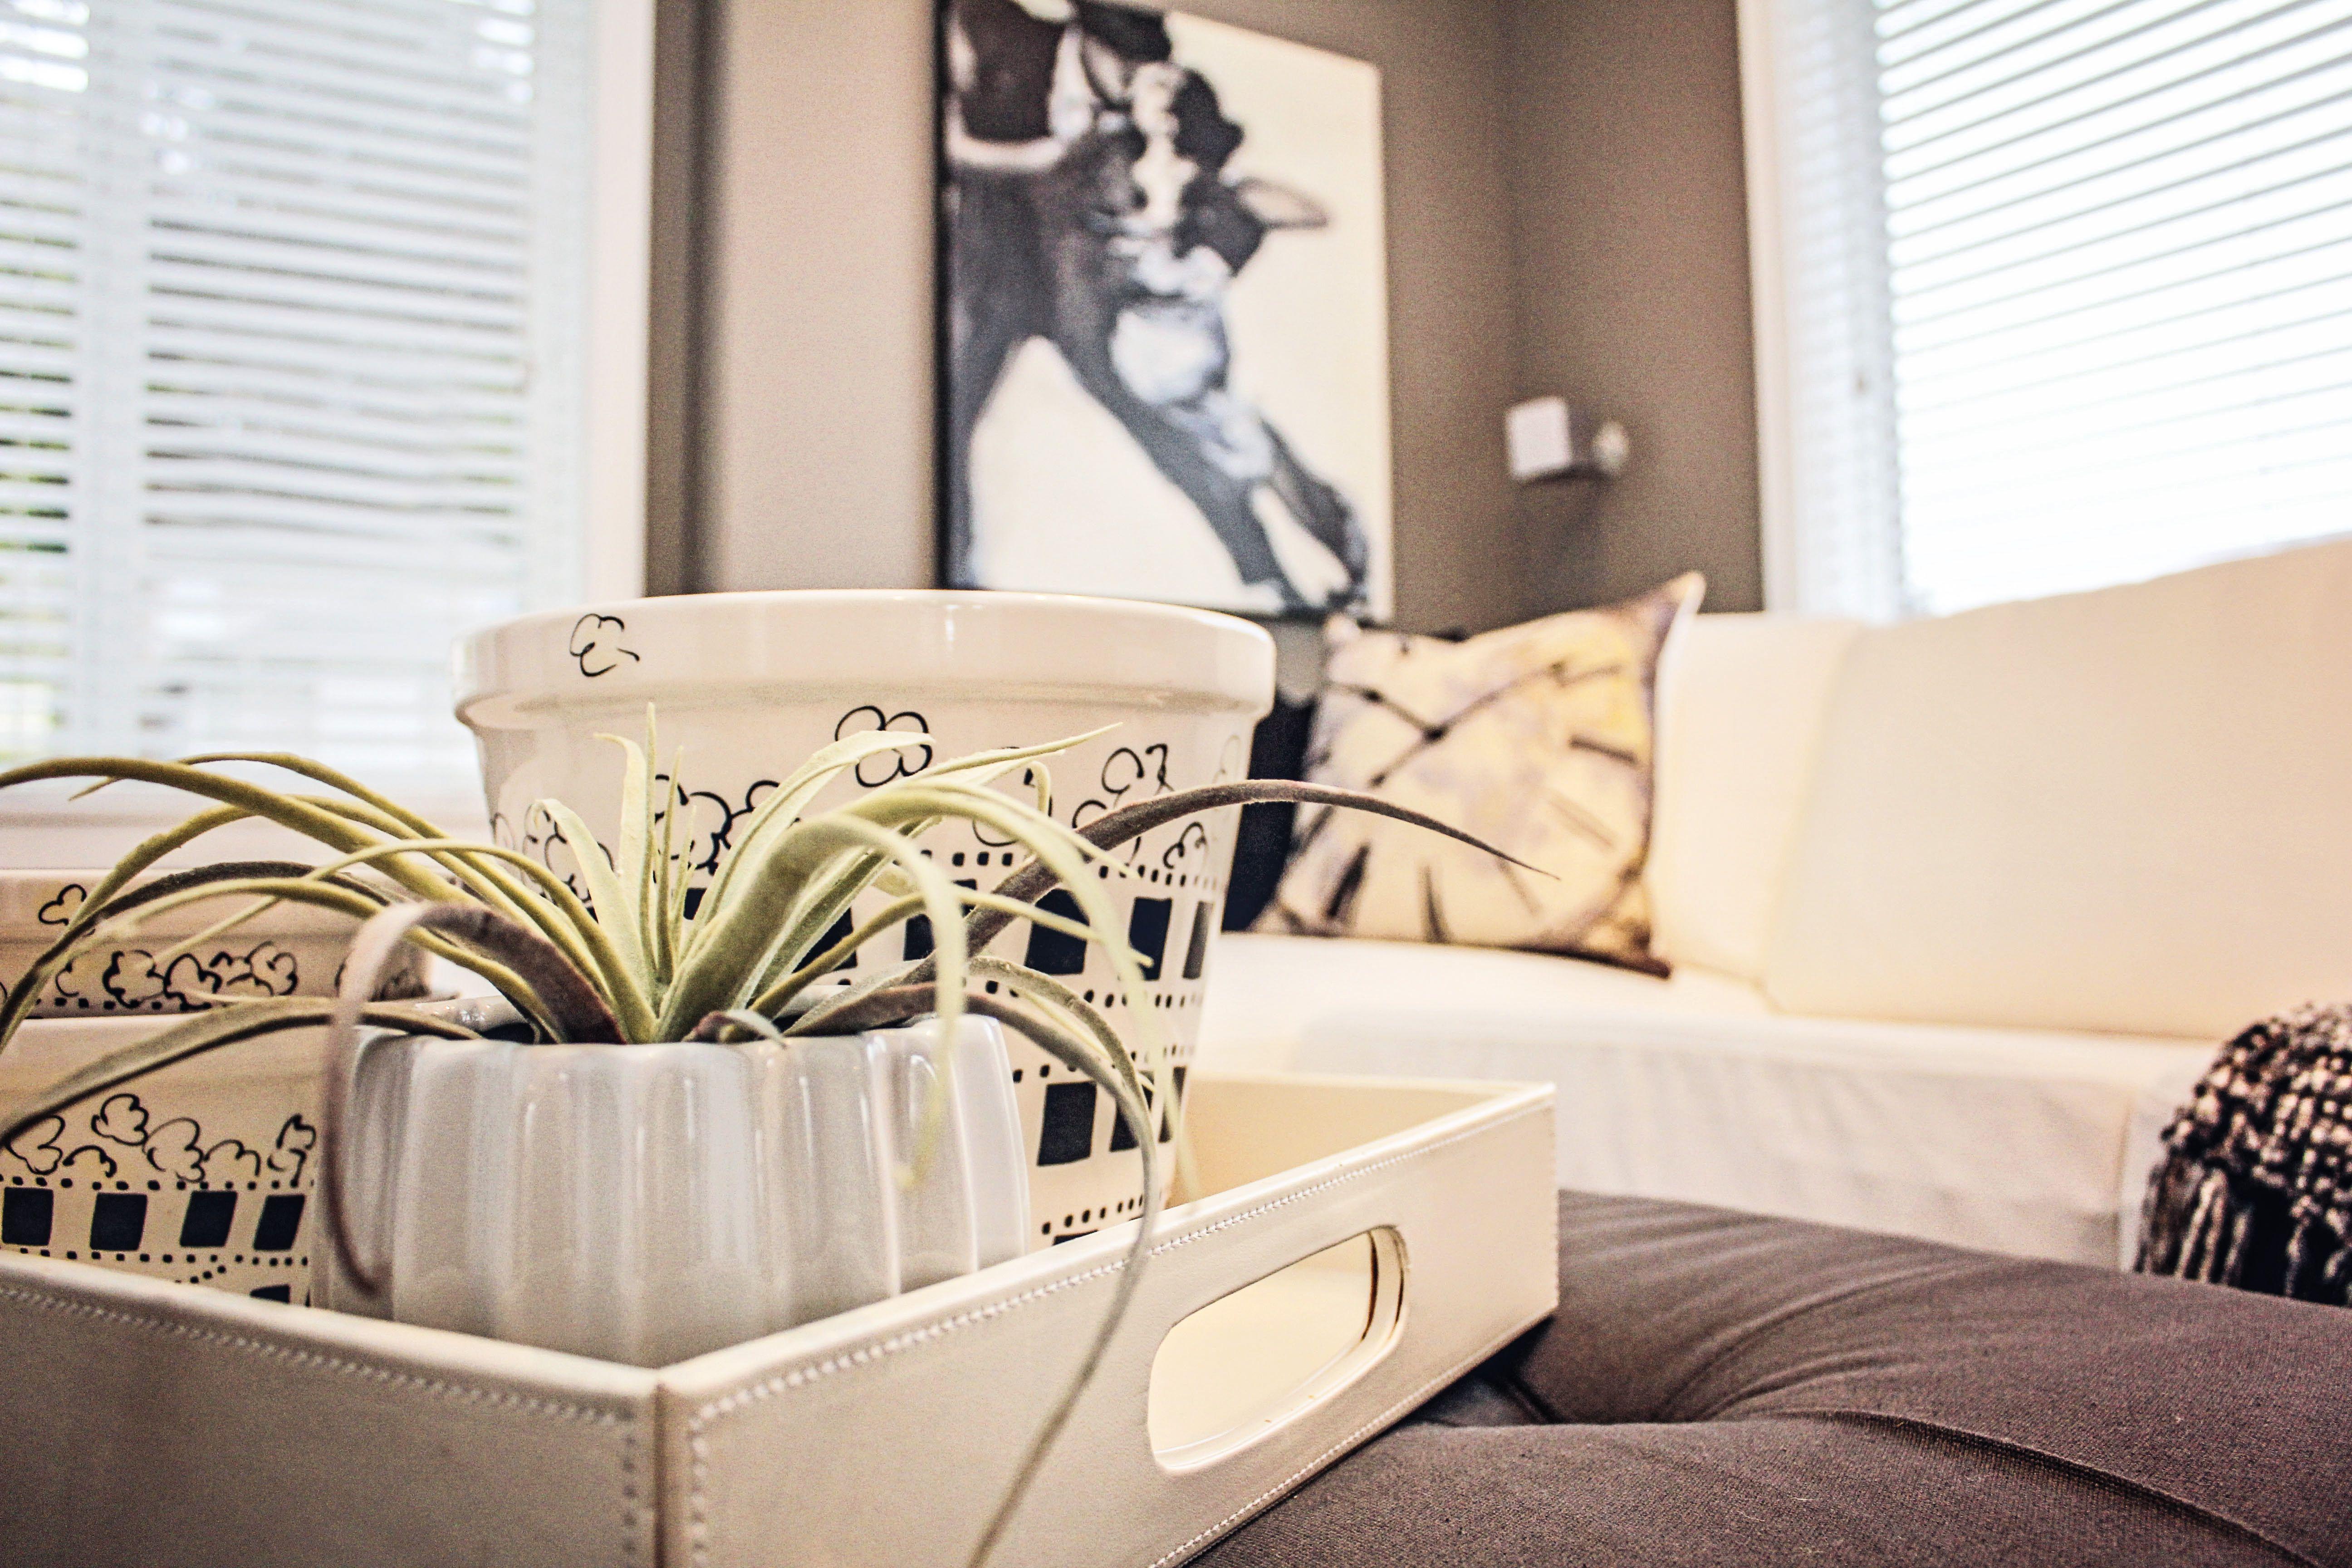 #Interiordesignphotography, #clean, #white, #modern, #plant, #Victoria, #BC, #Canada, #victoriabc #victoriaphotography #vancouverisland #bcphotographer, #karaphotography